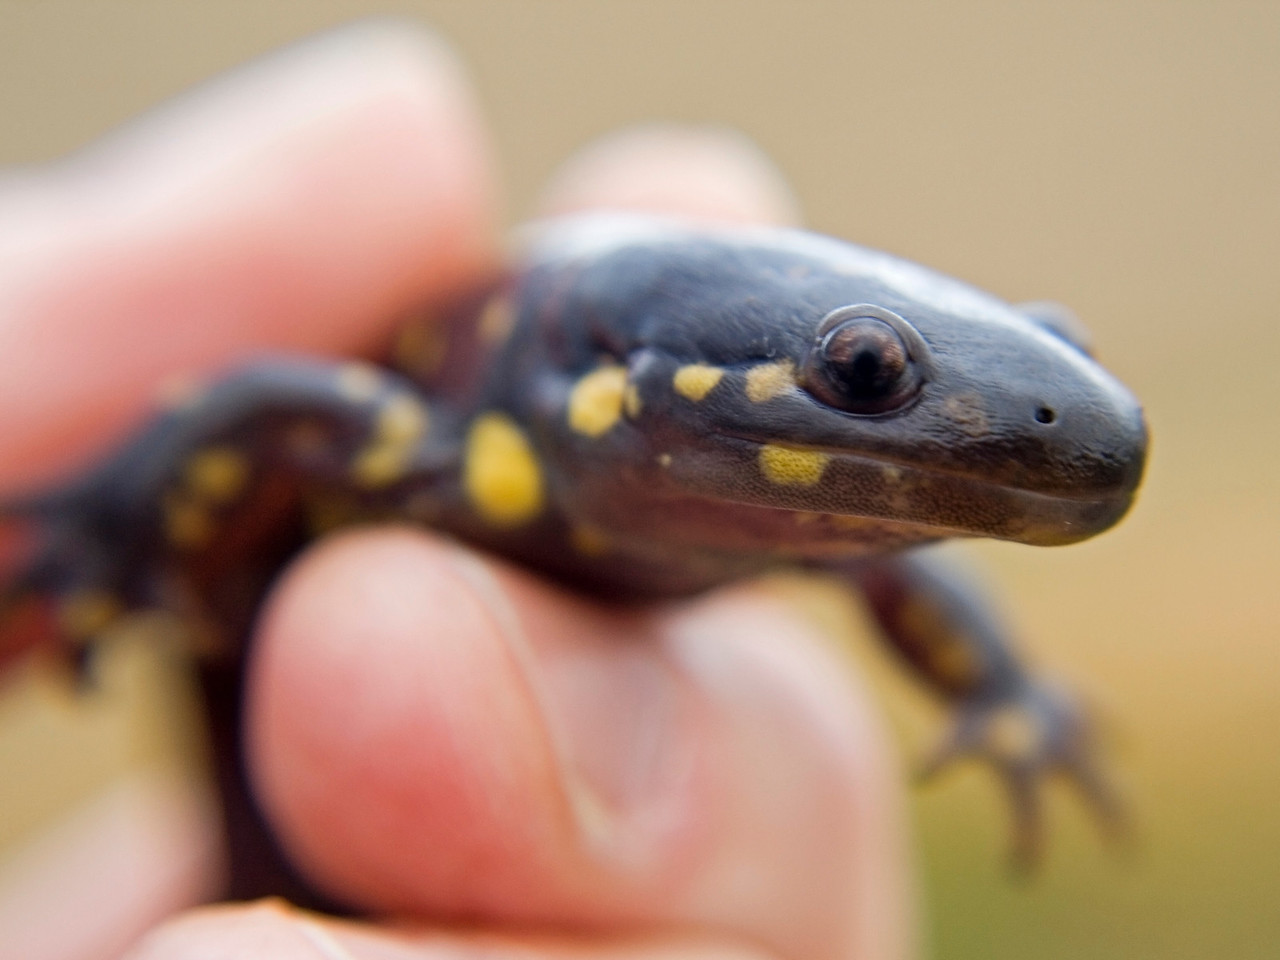 October 26 - Tiger Salamander